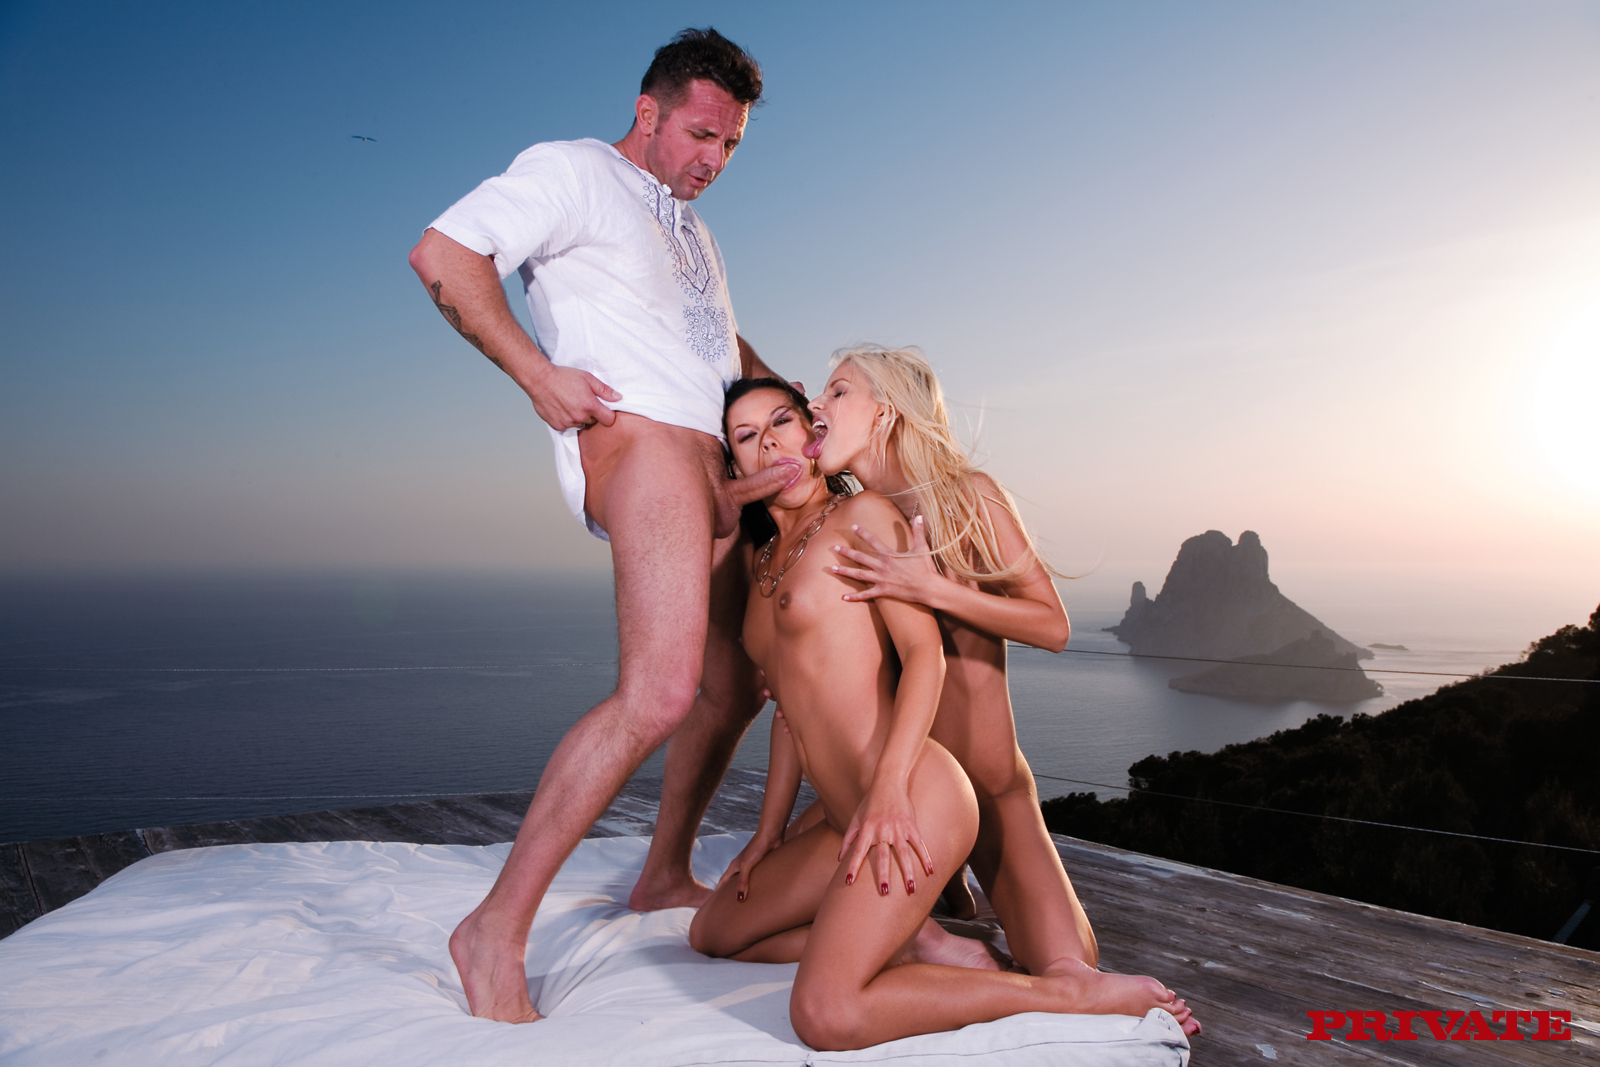 Секс фото на ибице, Голая девушка на пляже Ибицы - фото 22 фотография